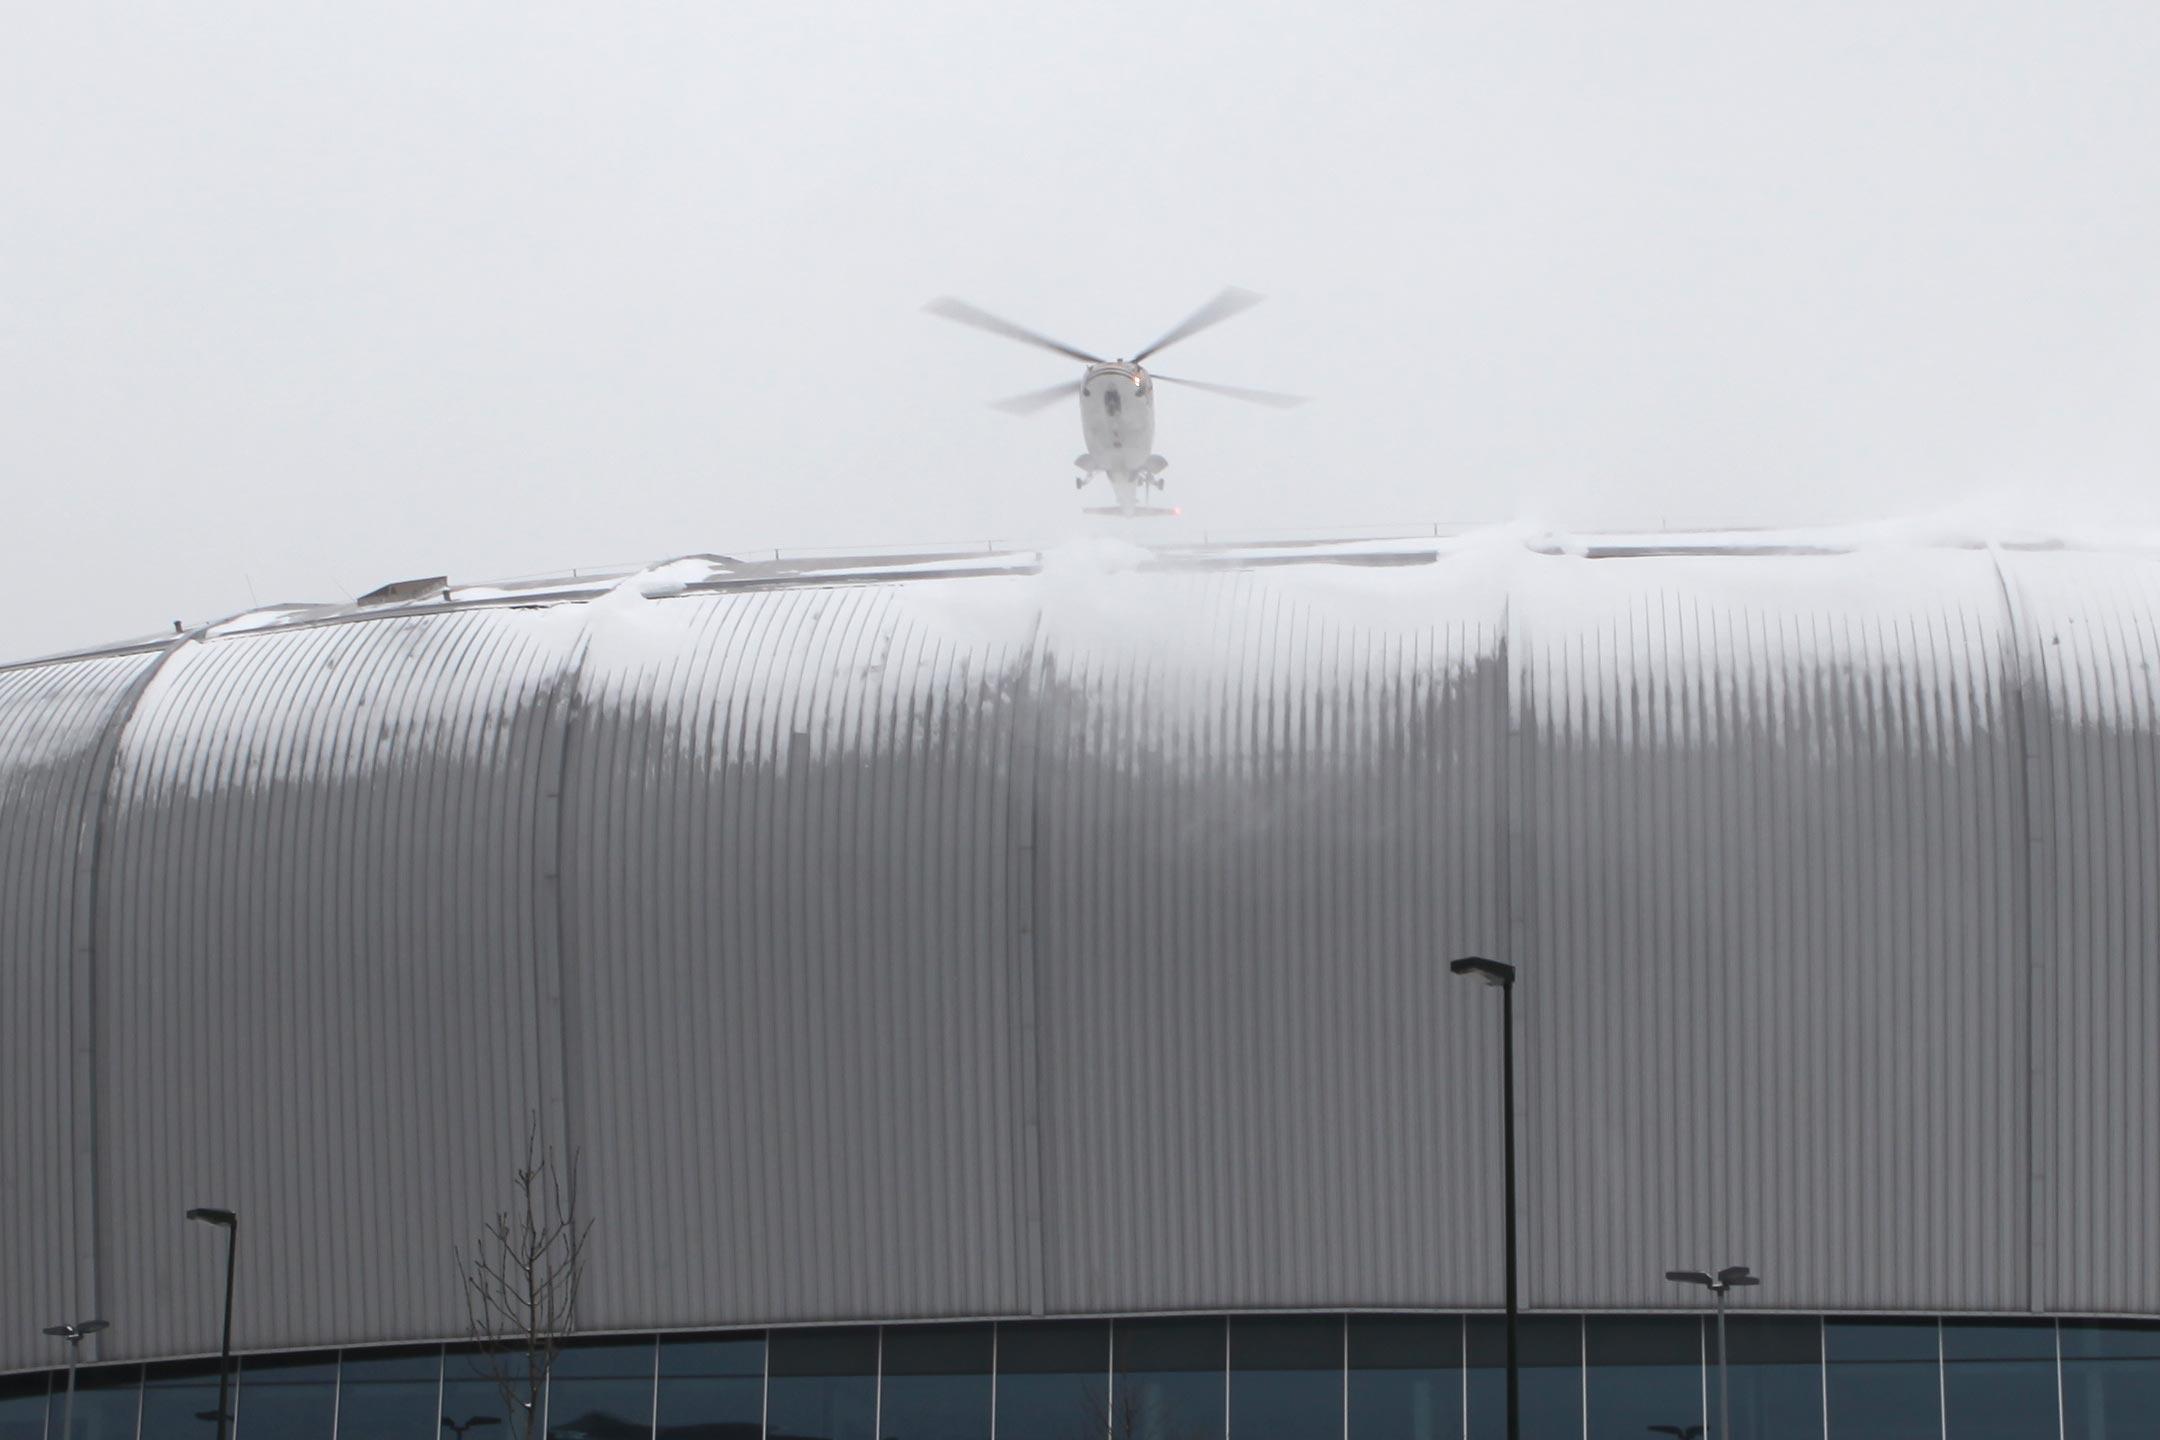 schneeflug iss dome 14